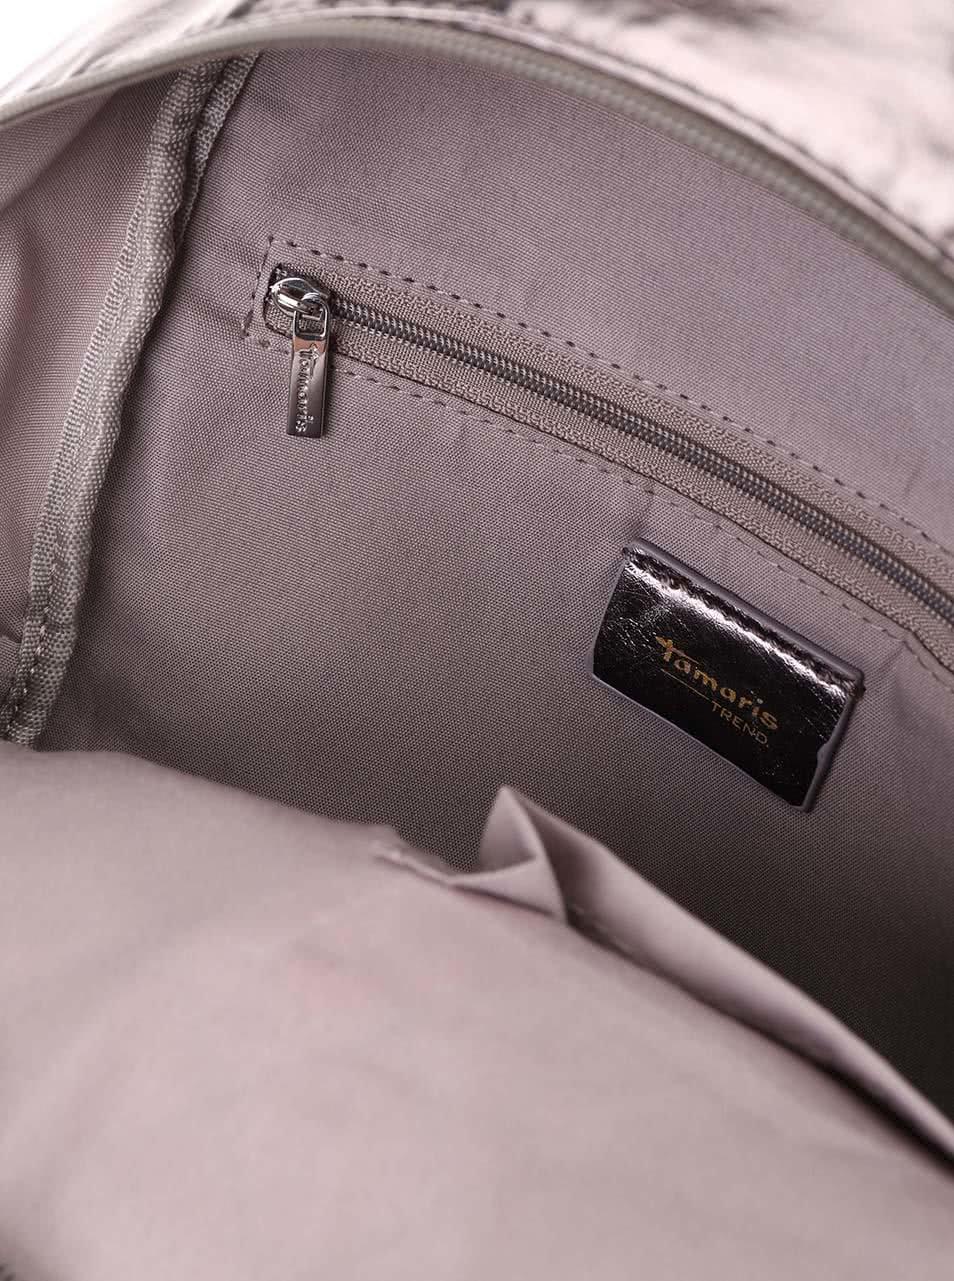 Metalický prešívaný batoh Tamaris Sophie ... 0fb8dd1cfe9